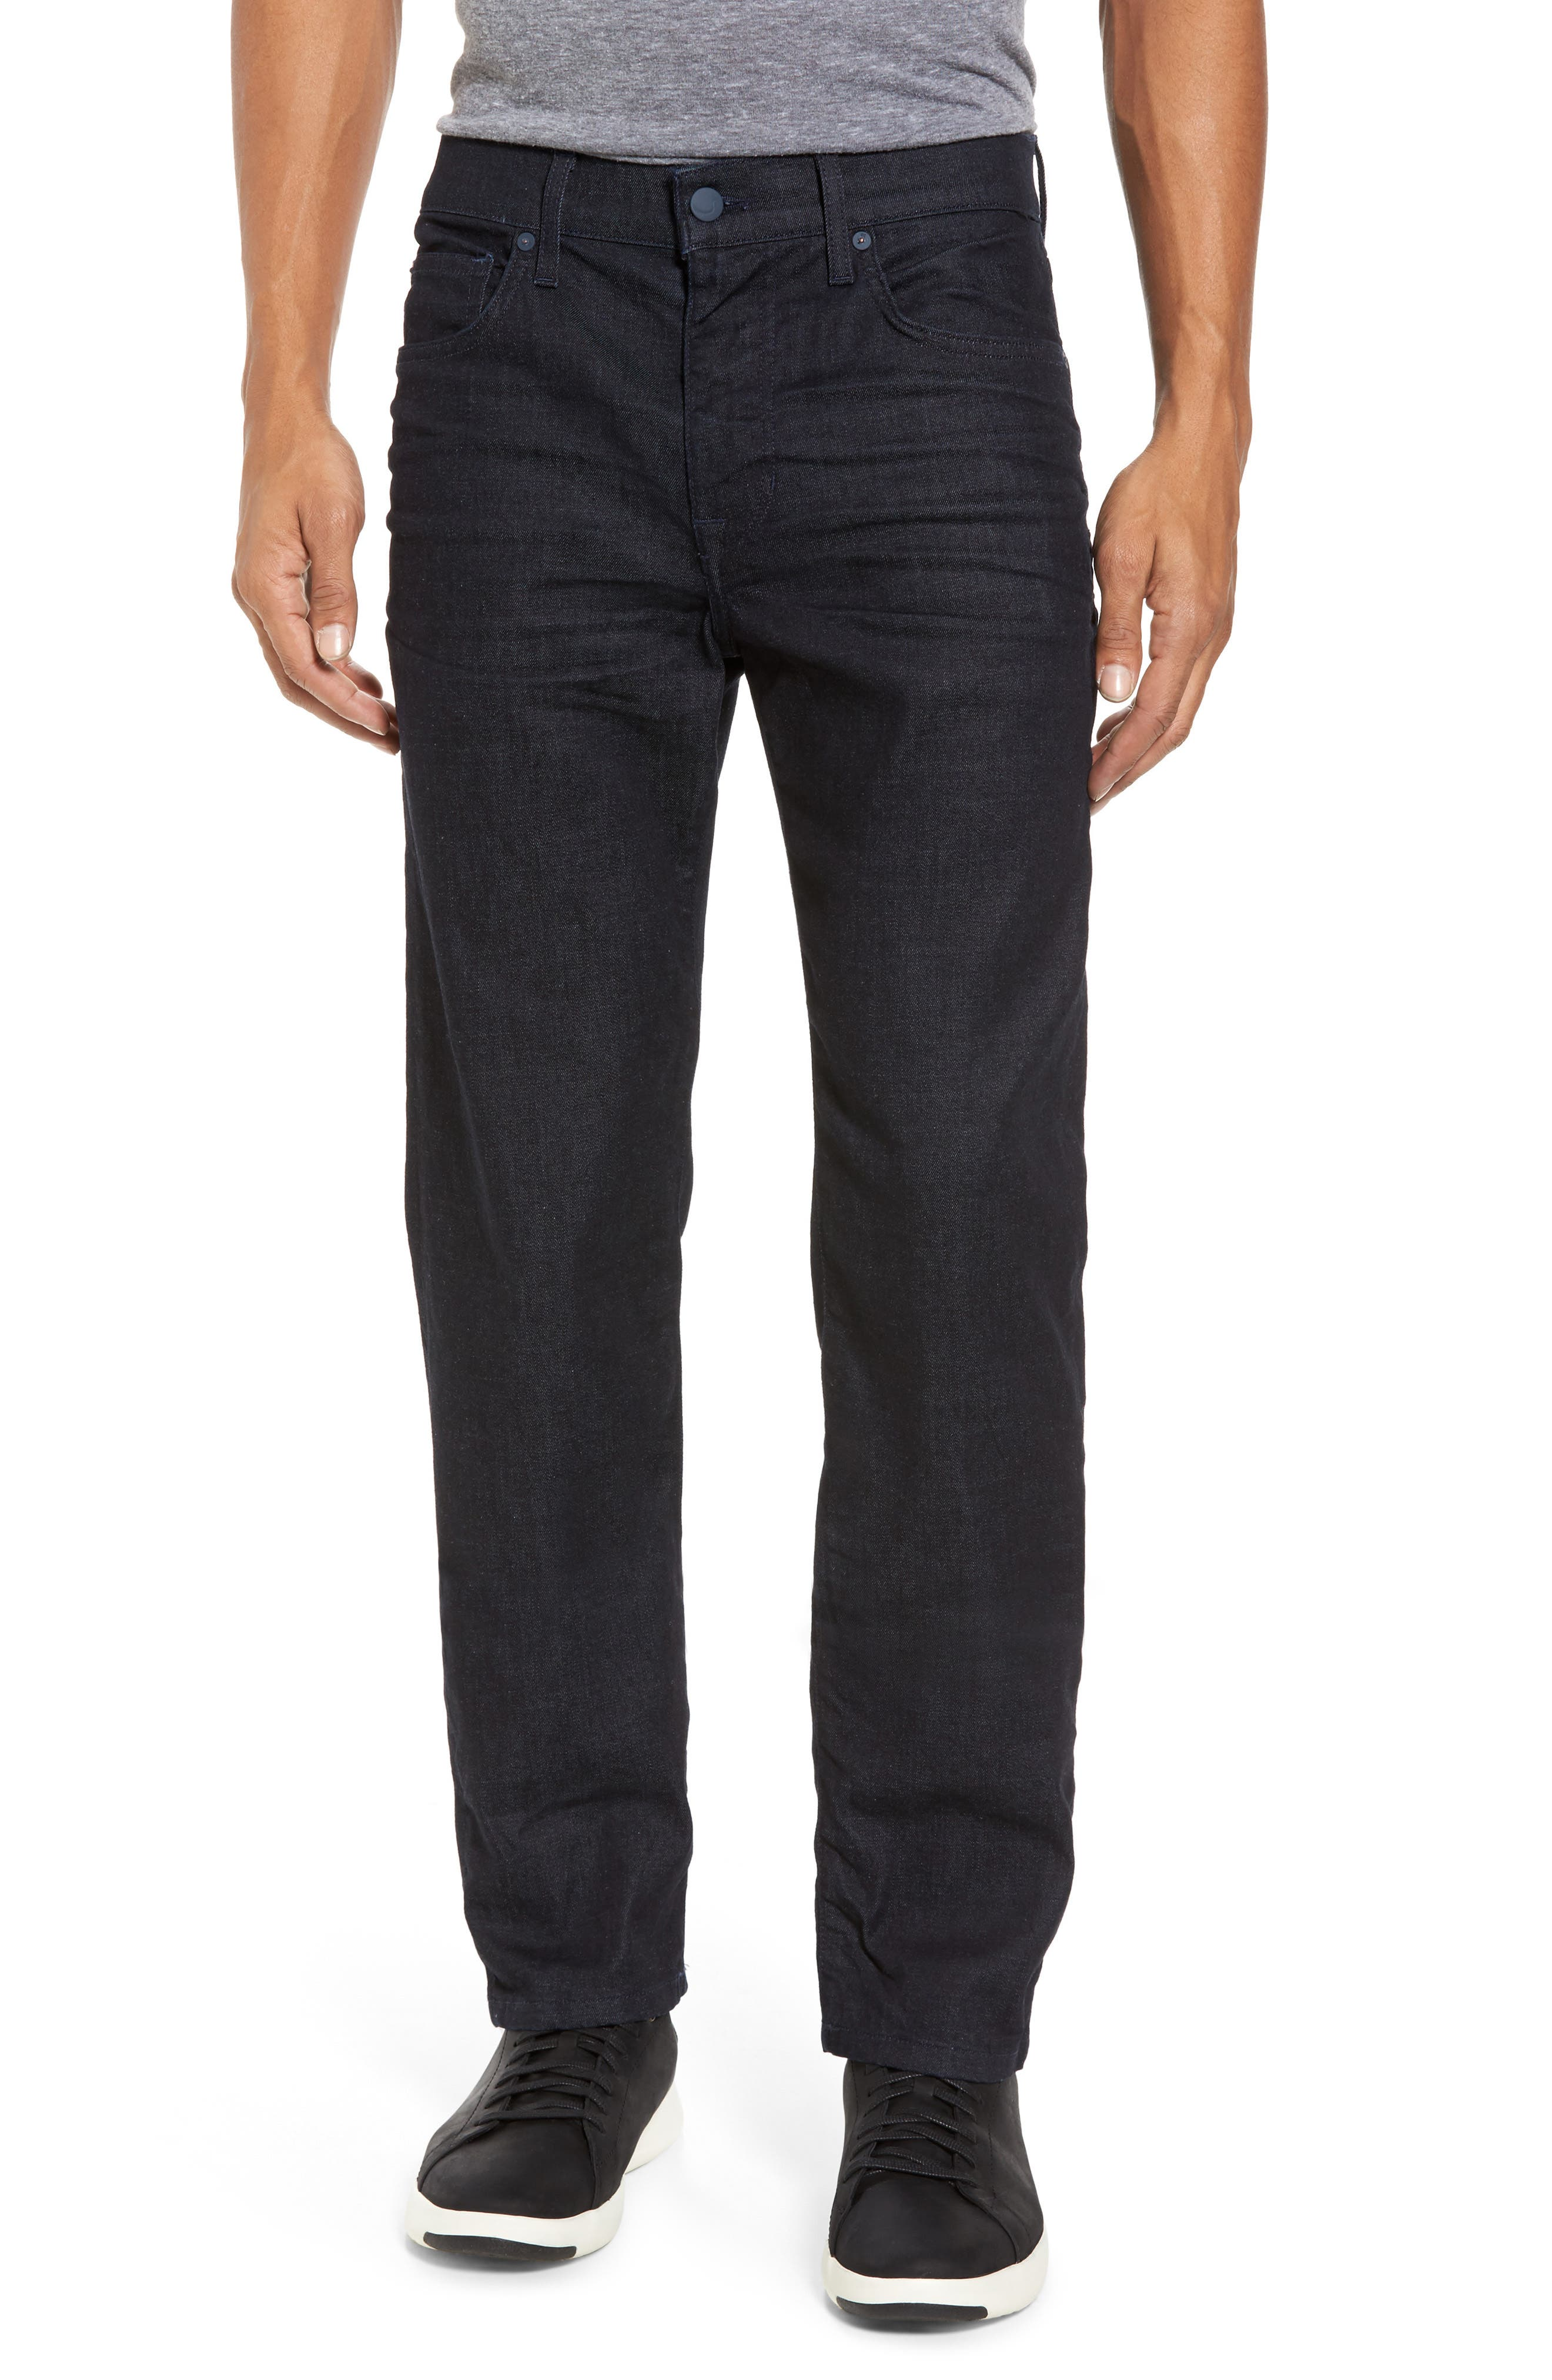 Brixton Slim Straight Fit Jeans,                         Main,                         color,